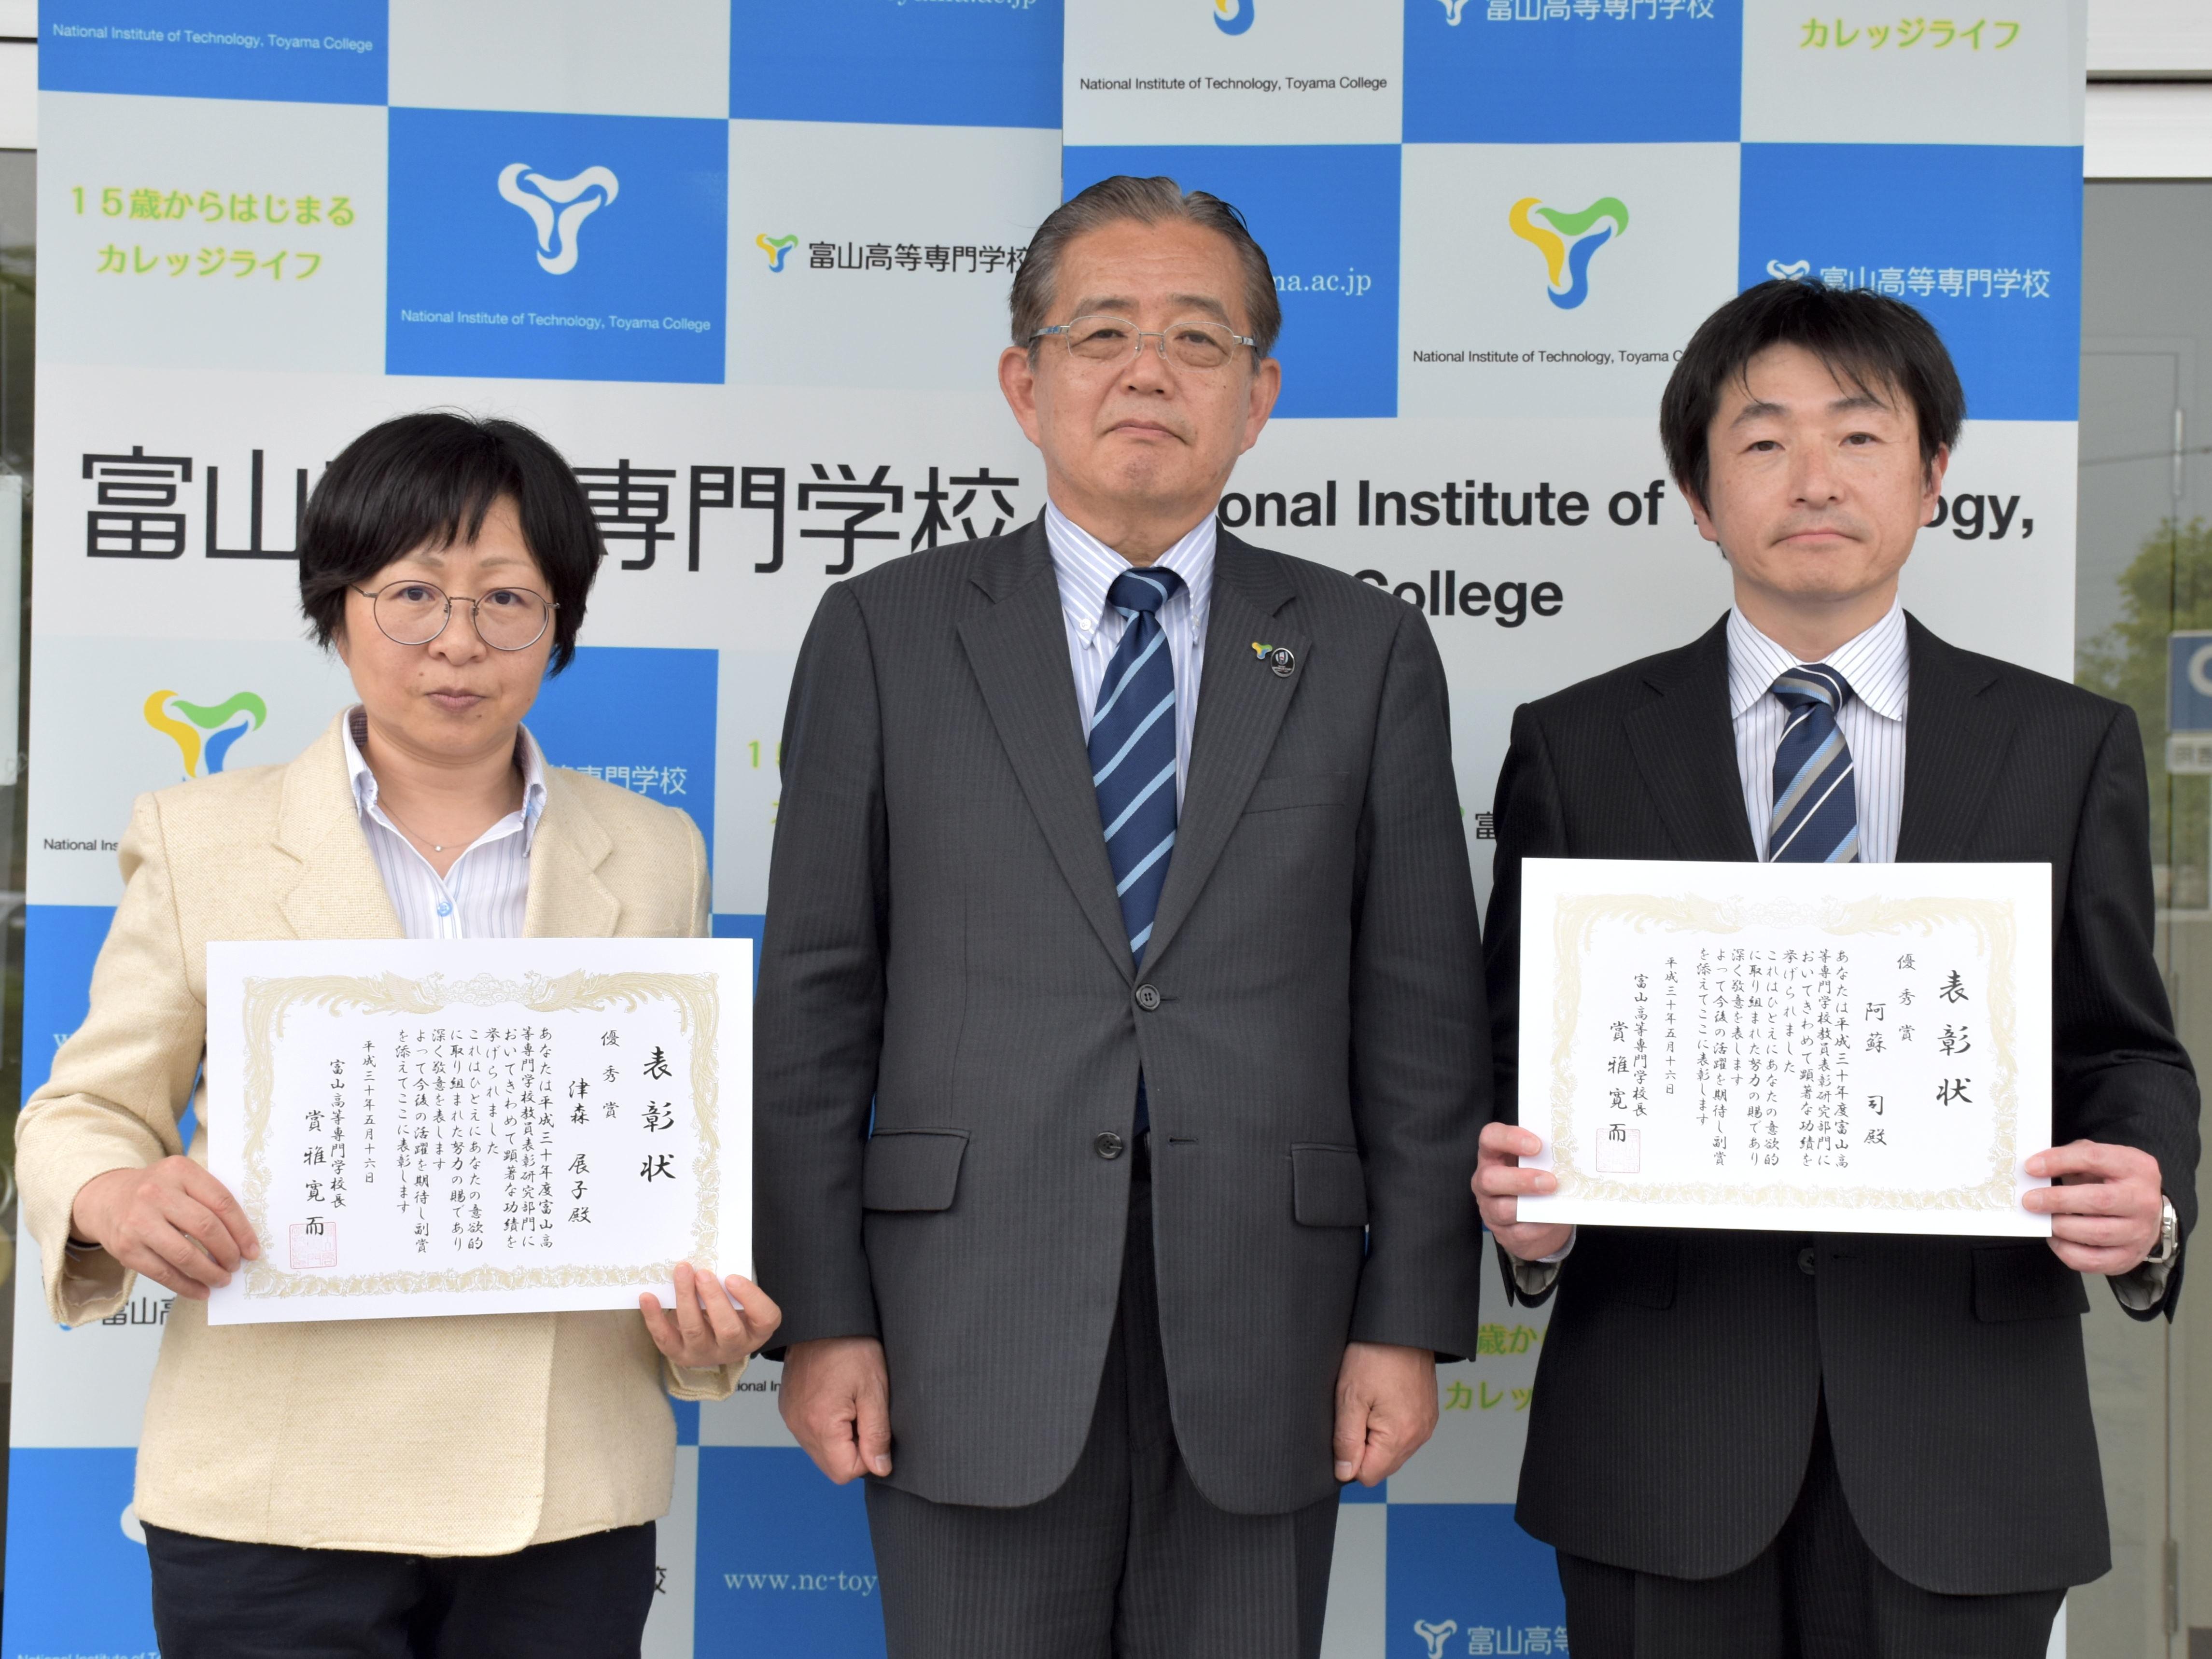 電子情報工学科 阿蘇教授、物質化学工学科 津森教授が教職員表彰を受賞しました。